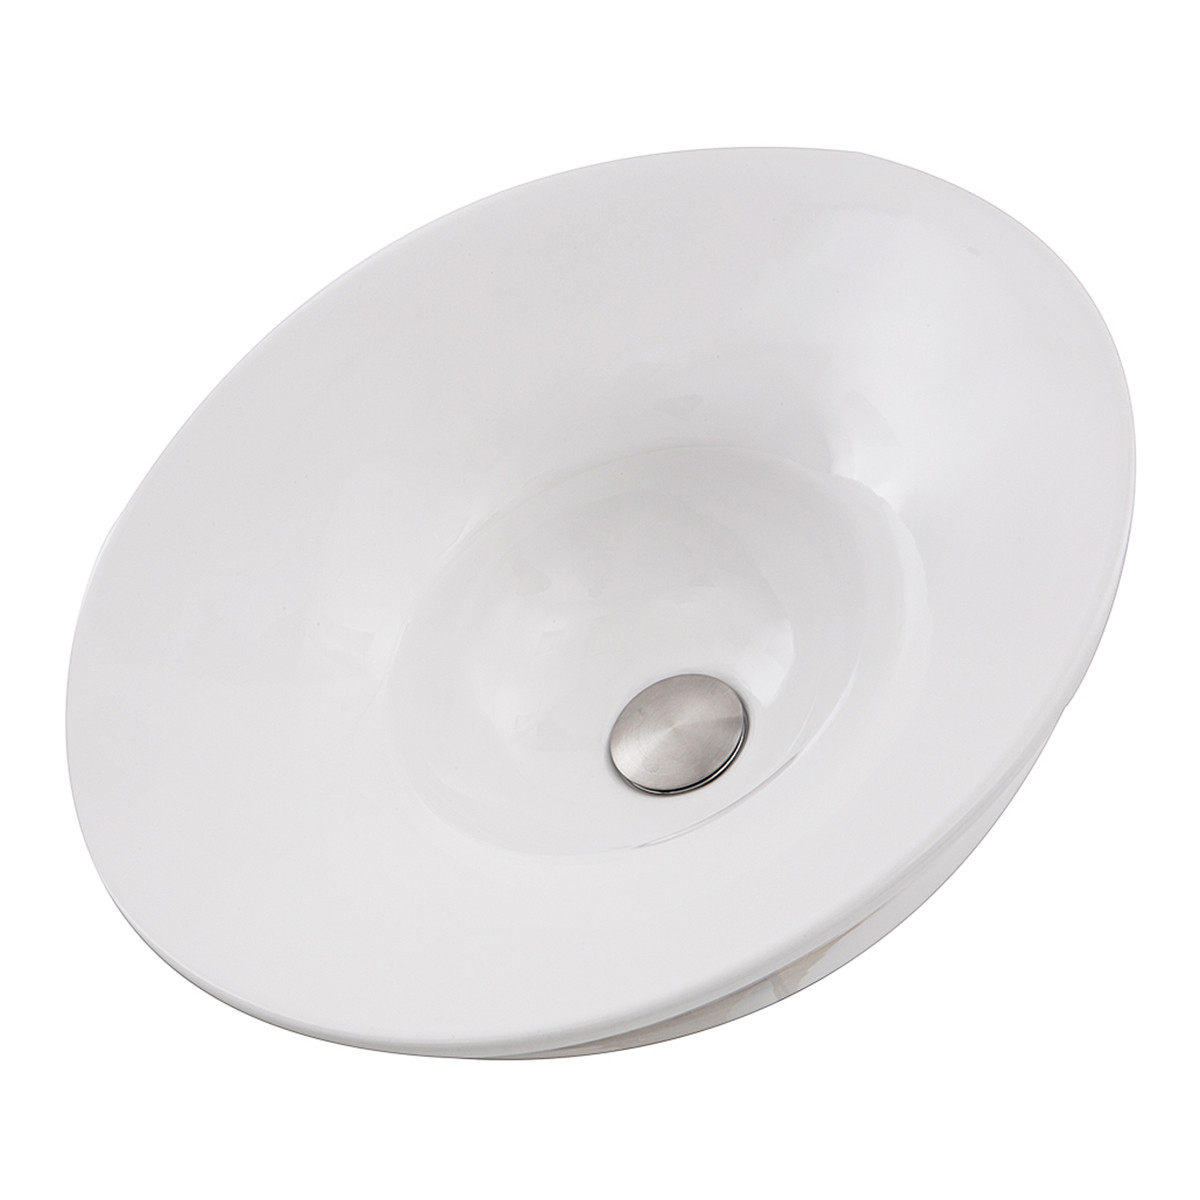 Nantucket Sinks RC77240W Dinard Italian Fireclay Vanity Sink In White